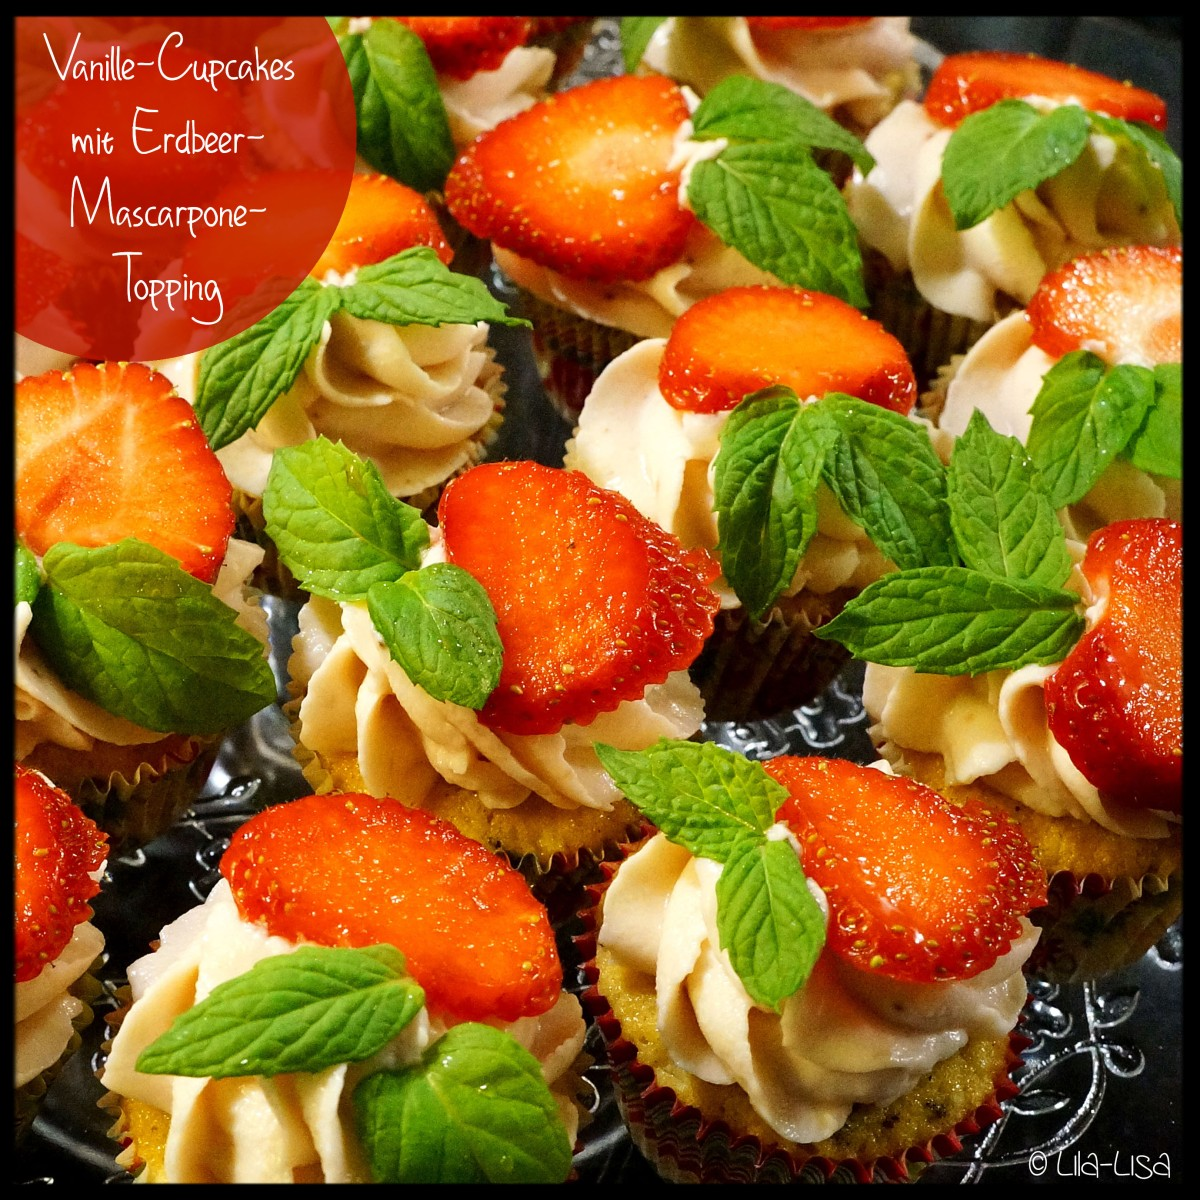 Happy Berry: Zweierlei Cupcakes mit Erdbeer-Mascarpone-Topping